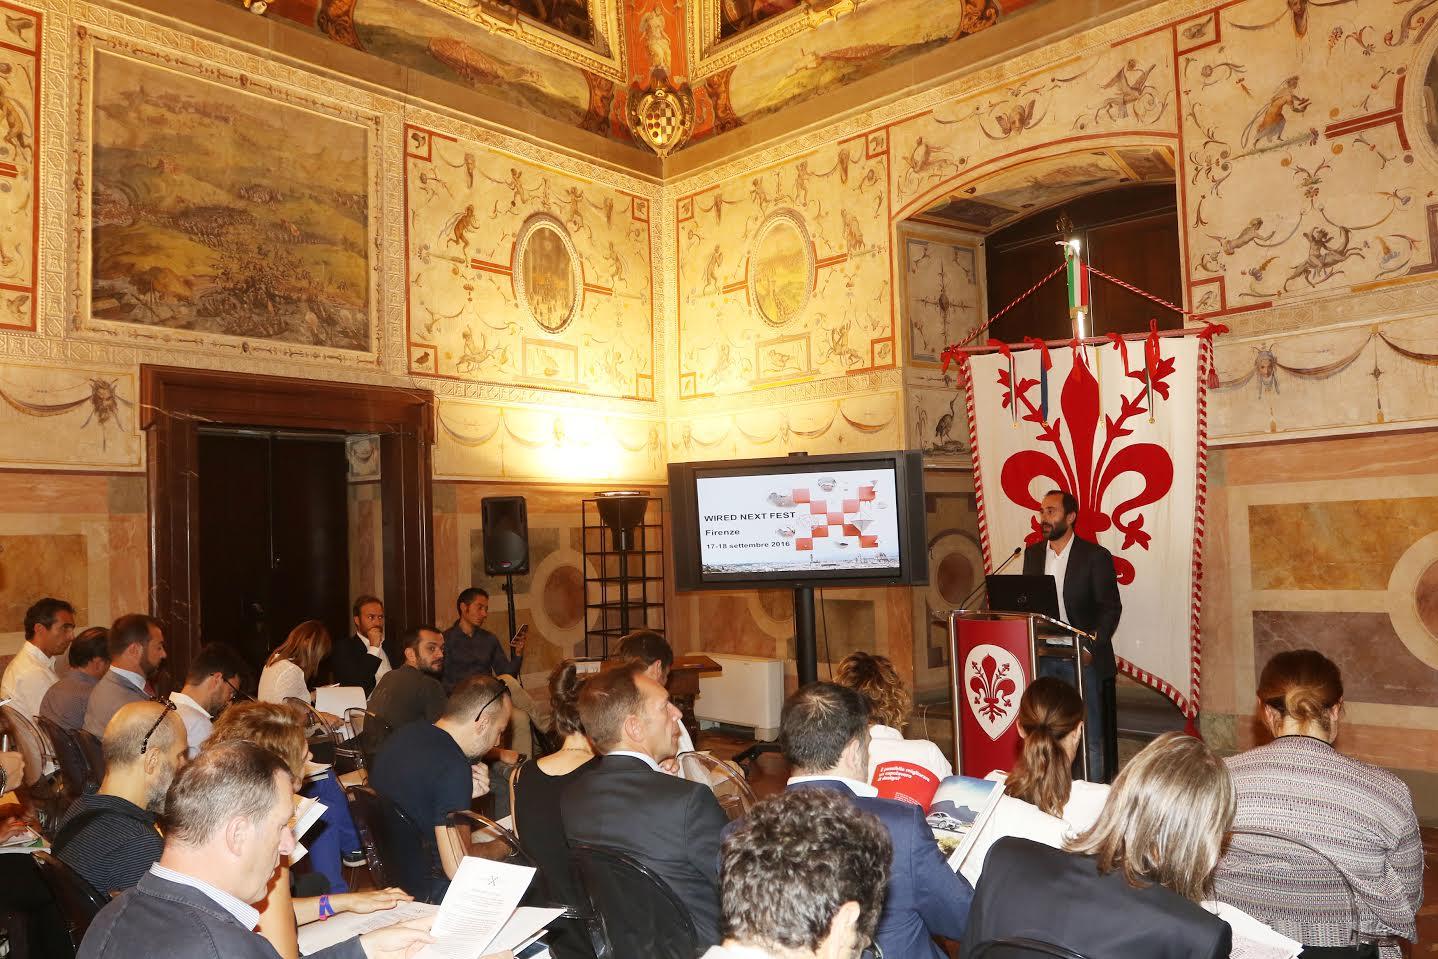 Wifi e postazioni di ricariche al Wired Next Fest di Firenze con Huawei